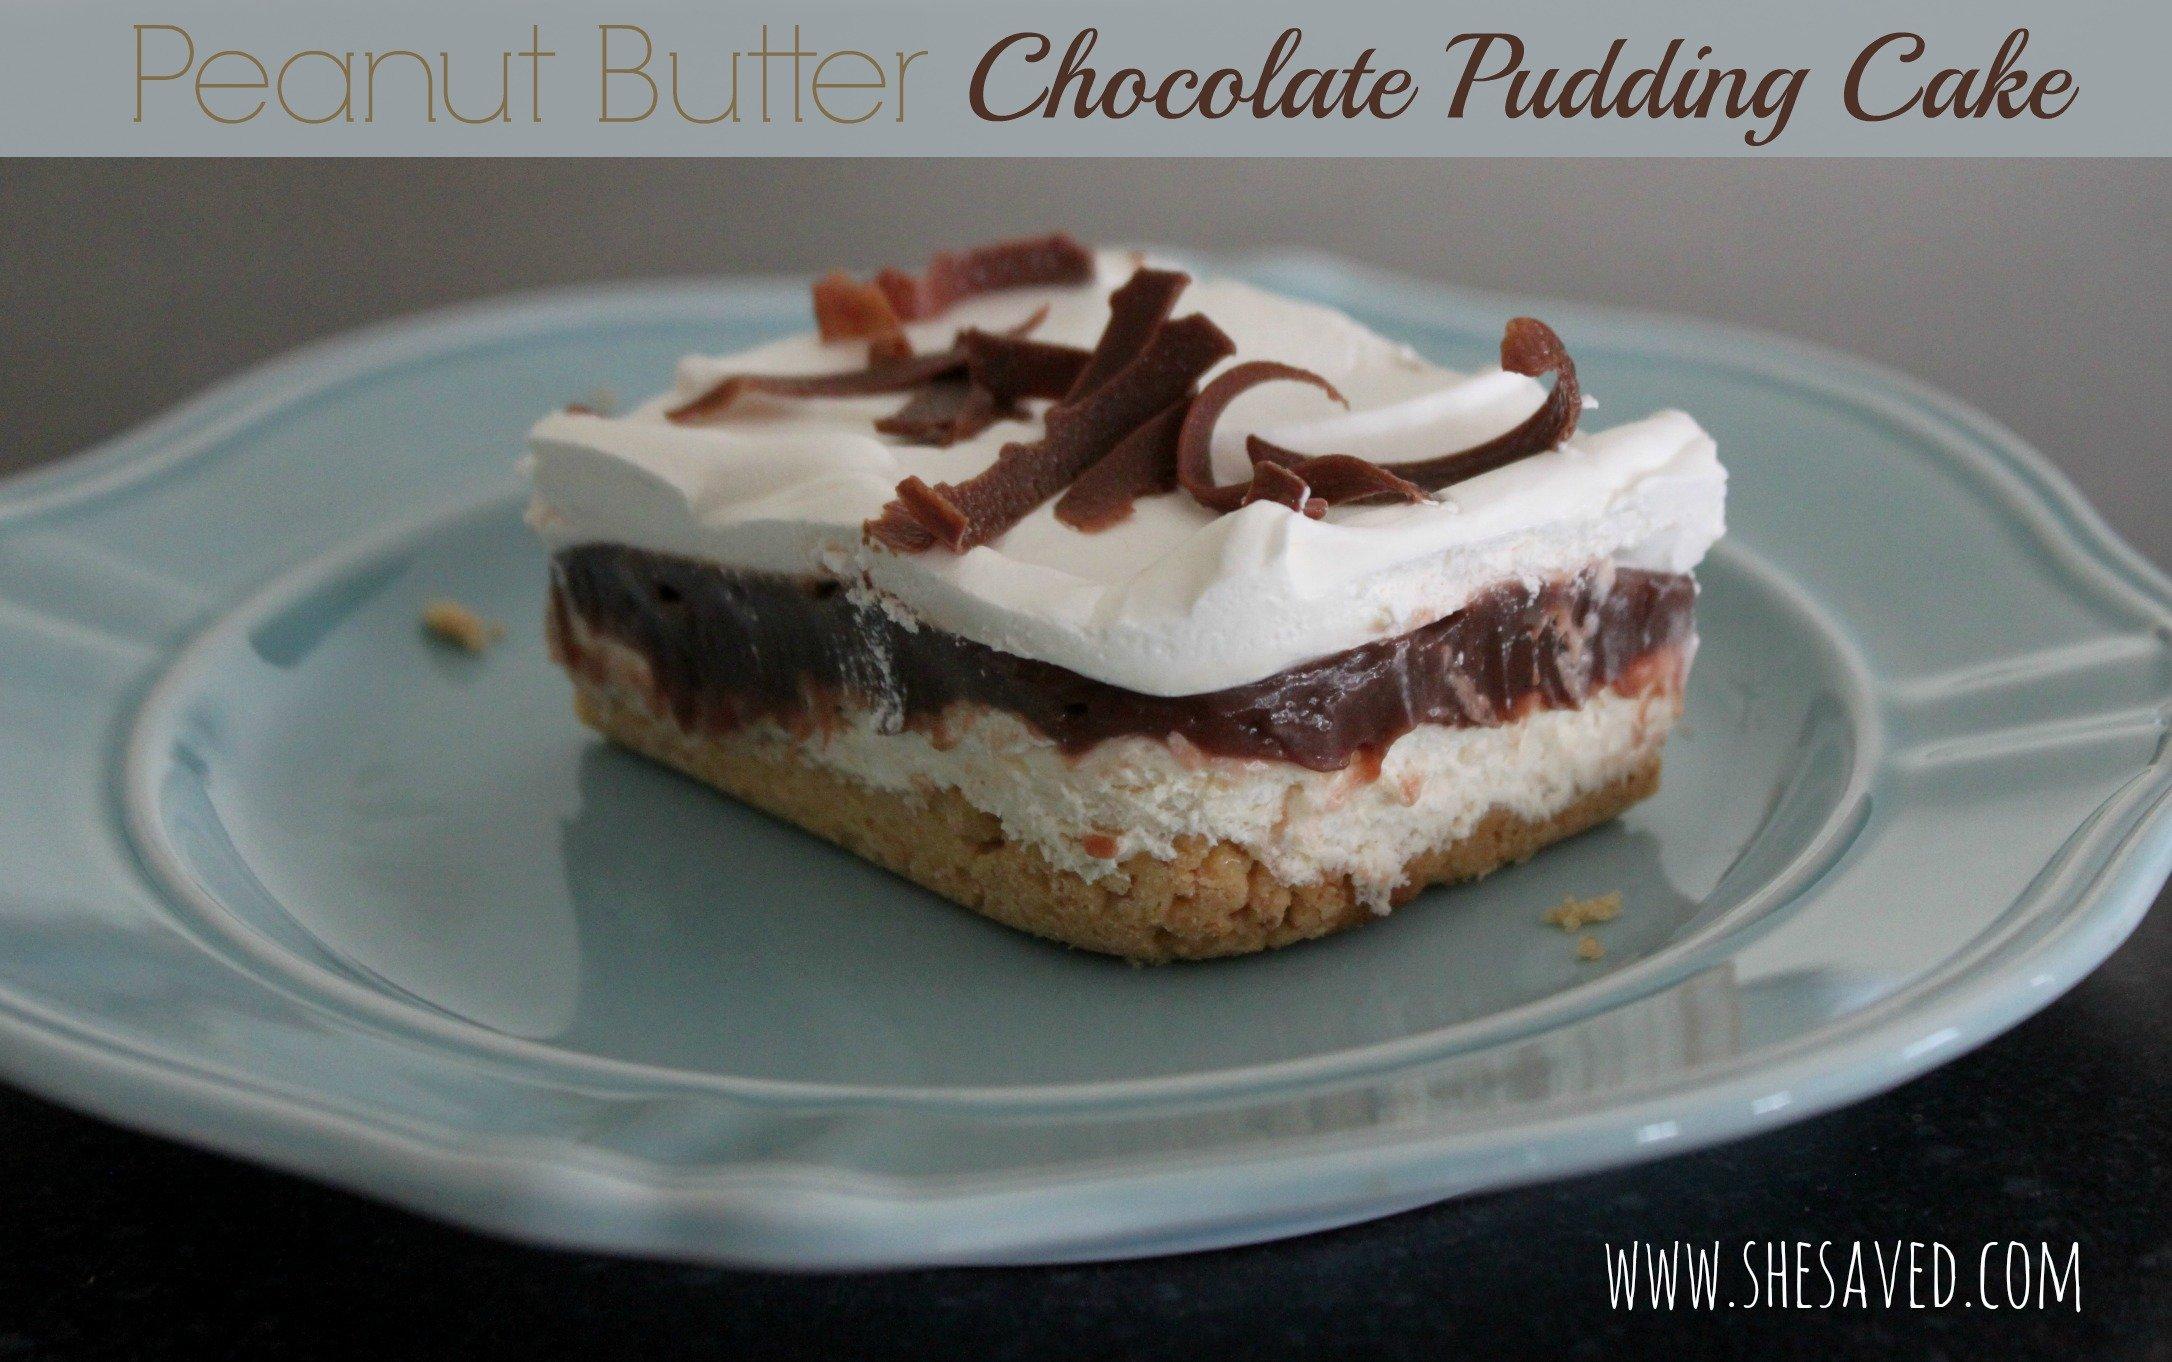 Peanut Butter Chocolate Pudding Cake